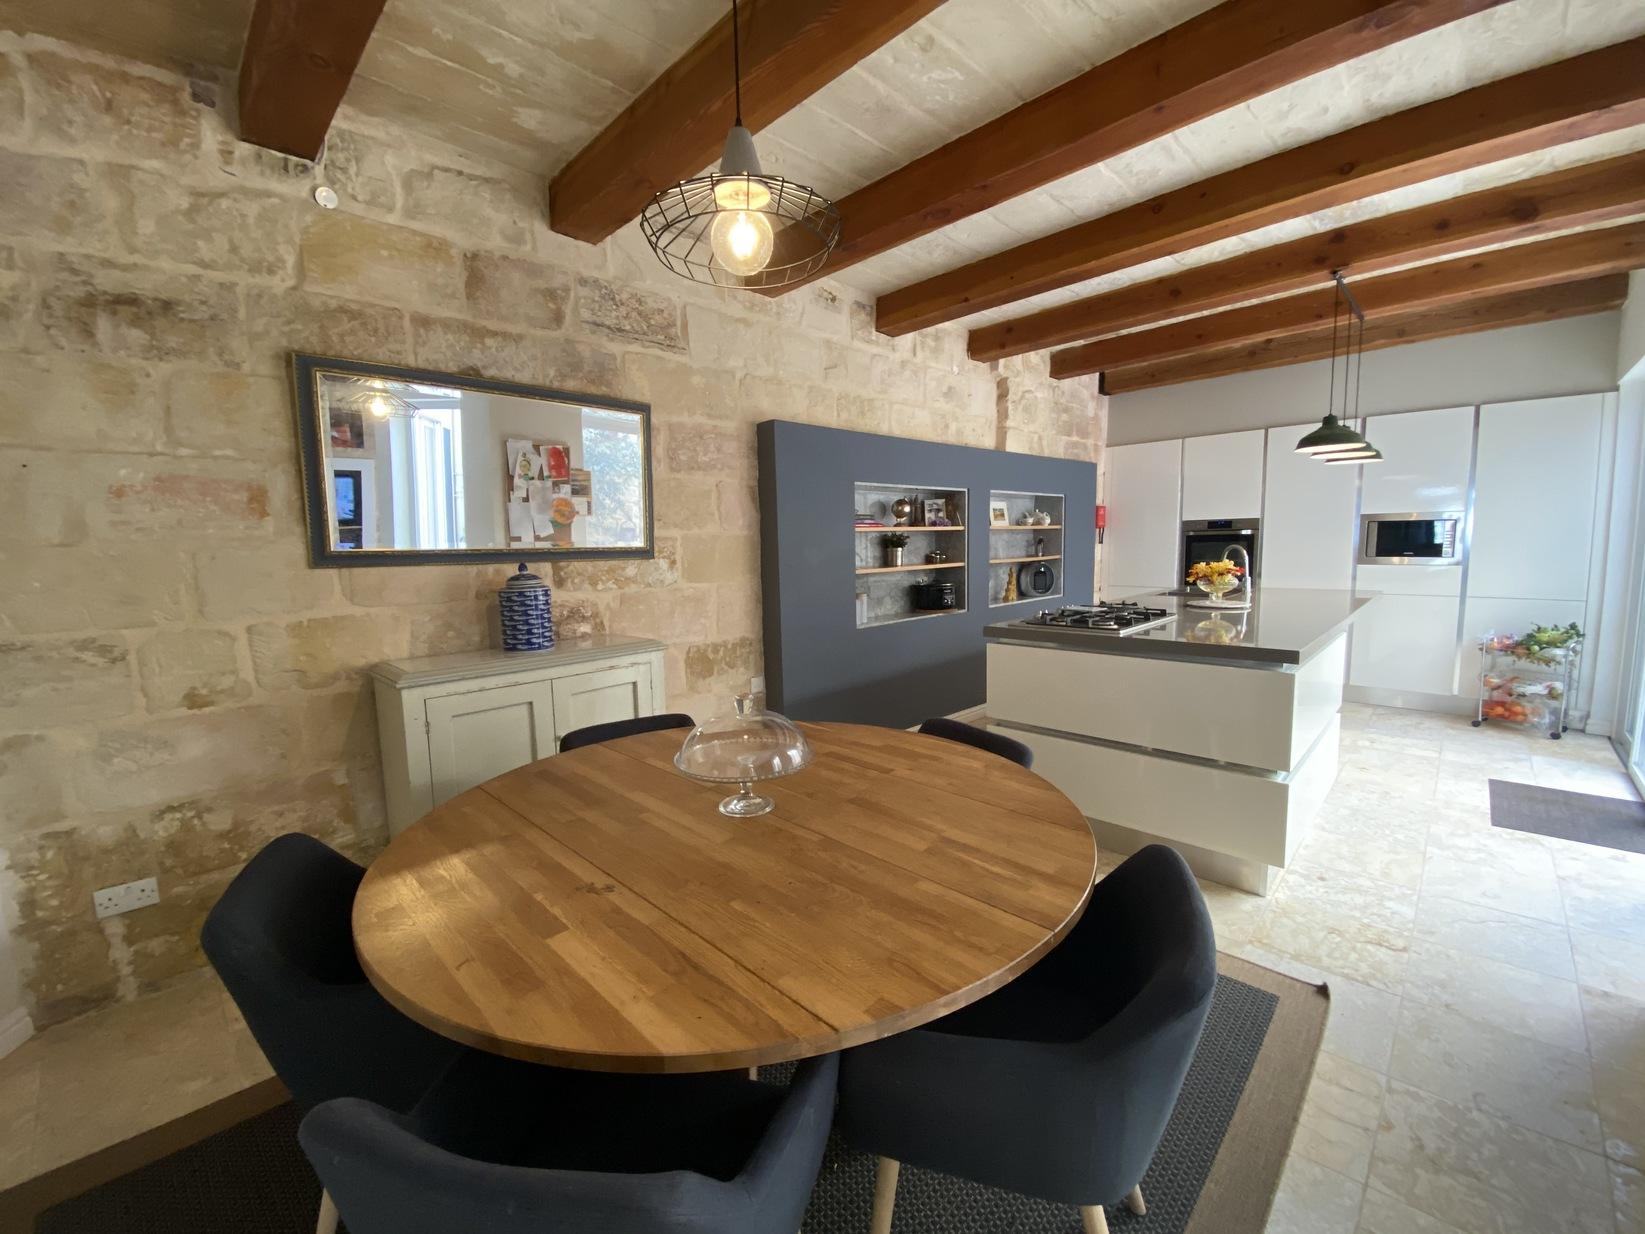 3 bed Town House For Rent in Lija, Lija - thumb 7